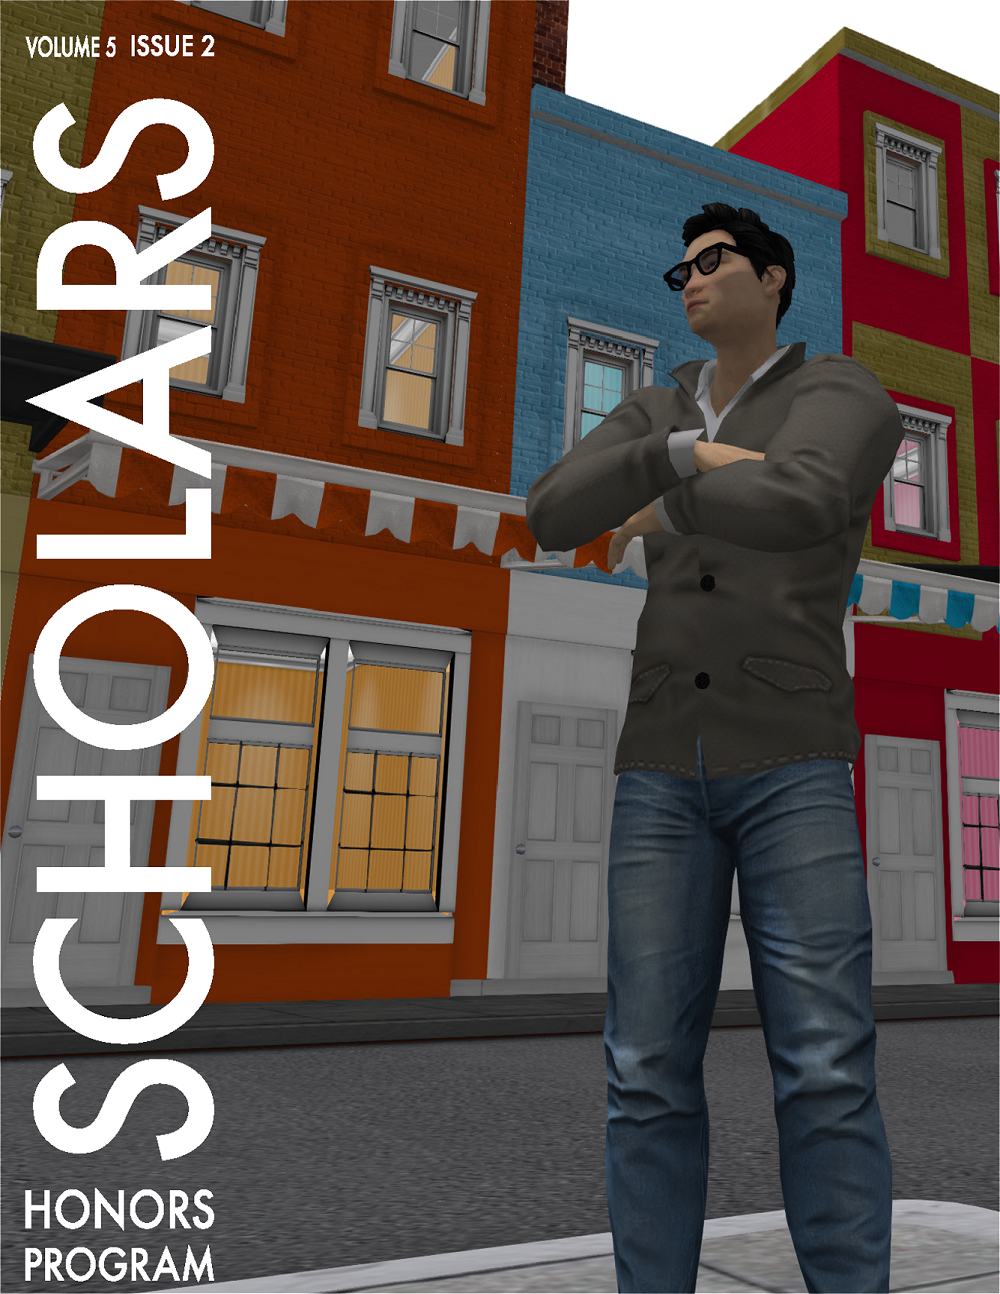 Scholars Volume 5 Issue 2